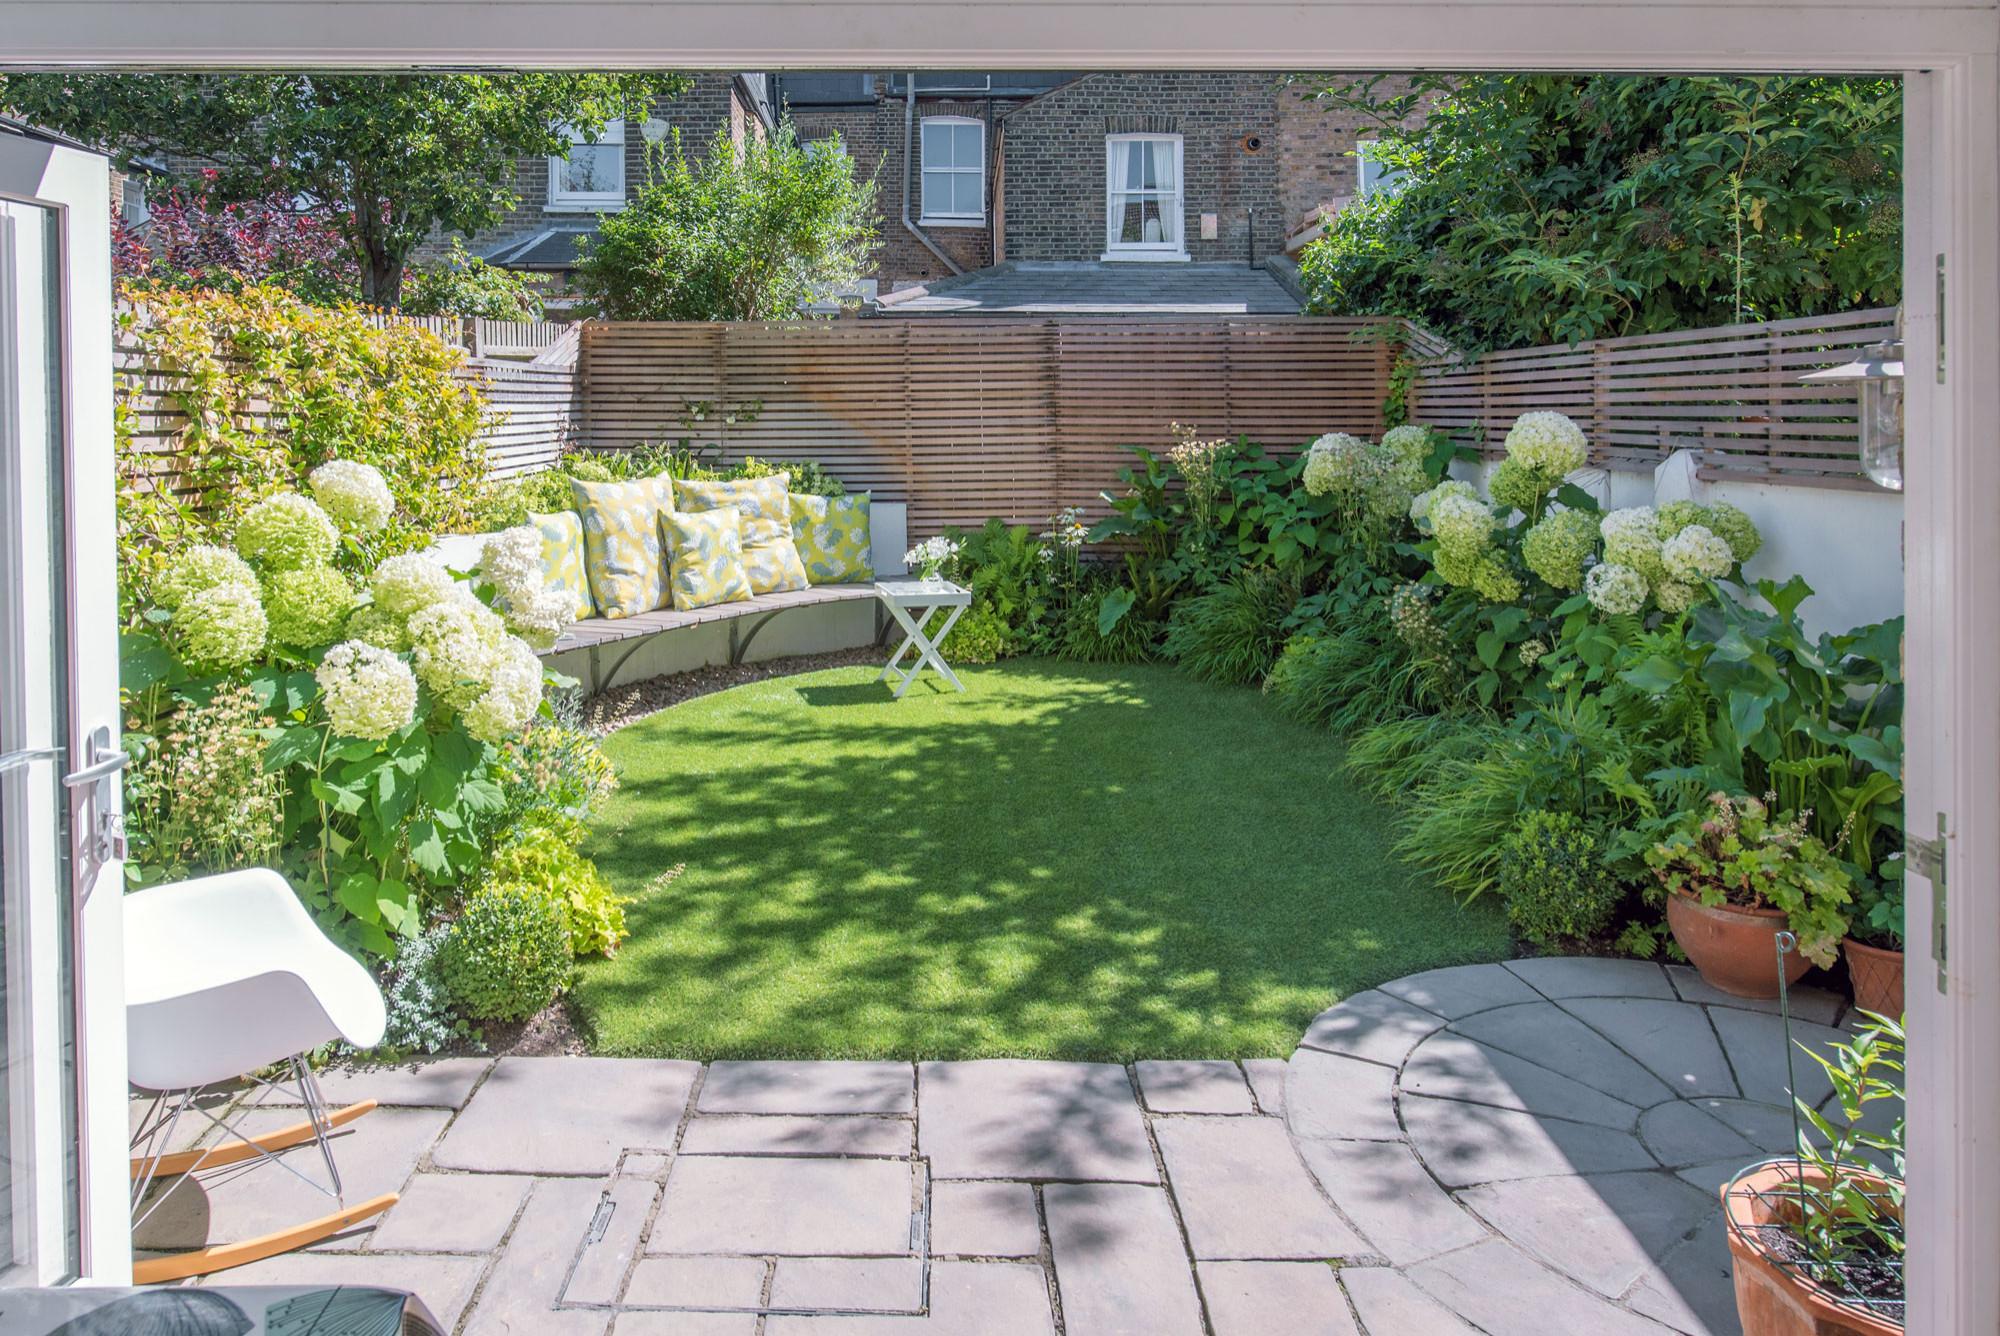 20 of the Best Small Urban Garden Ideas   Houzz UK